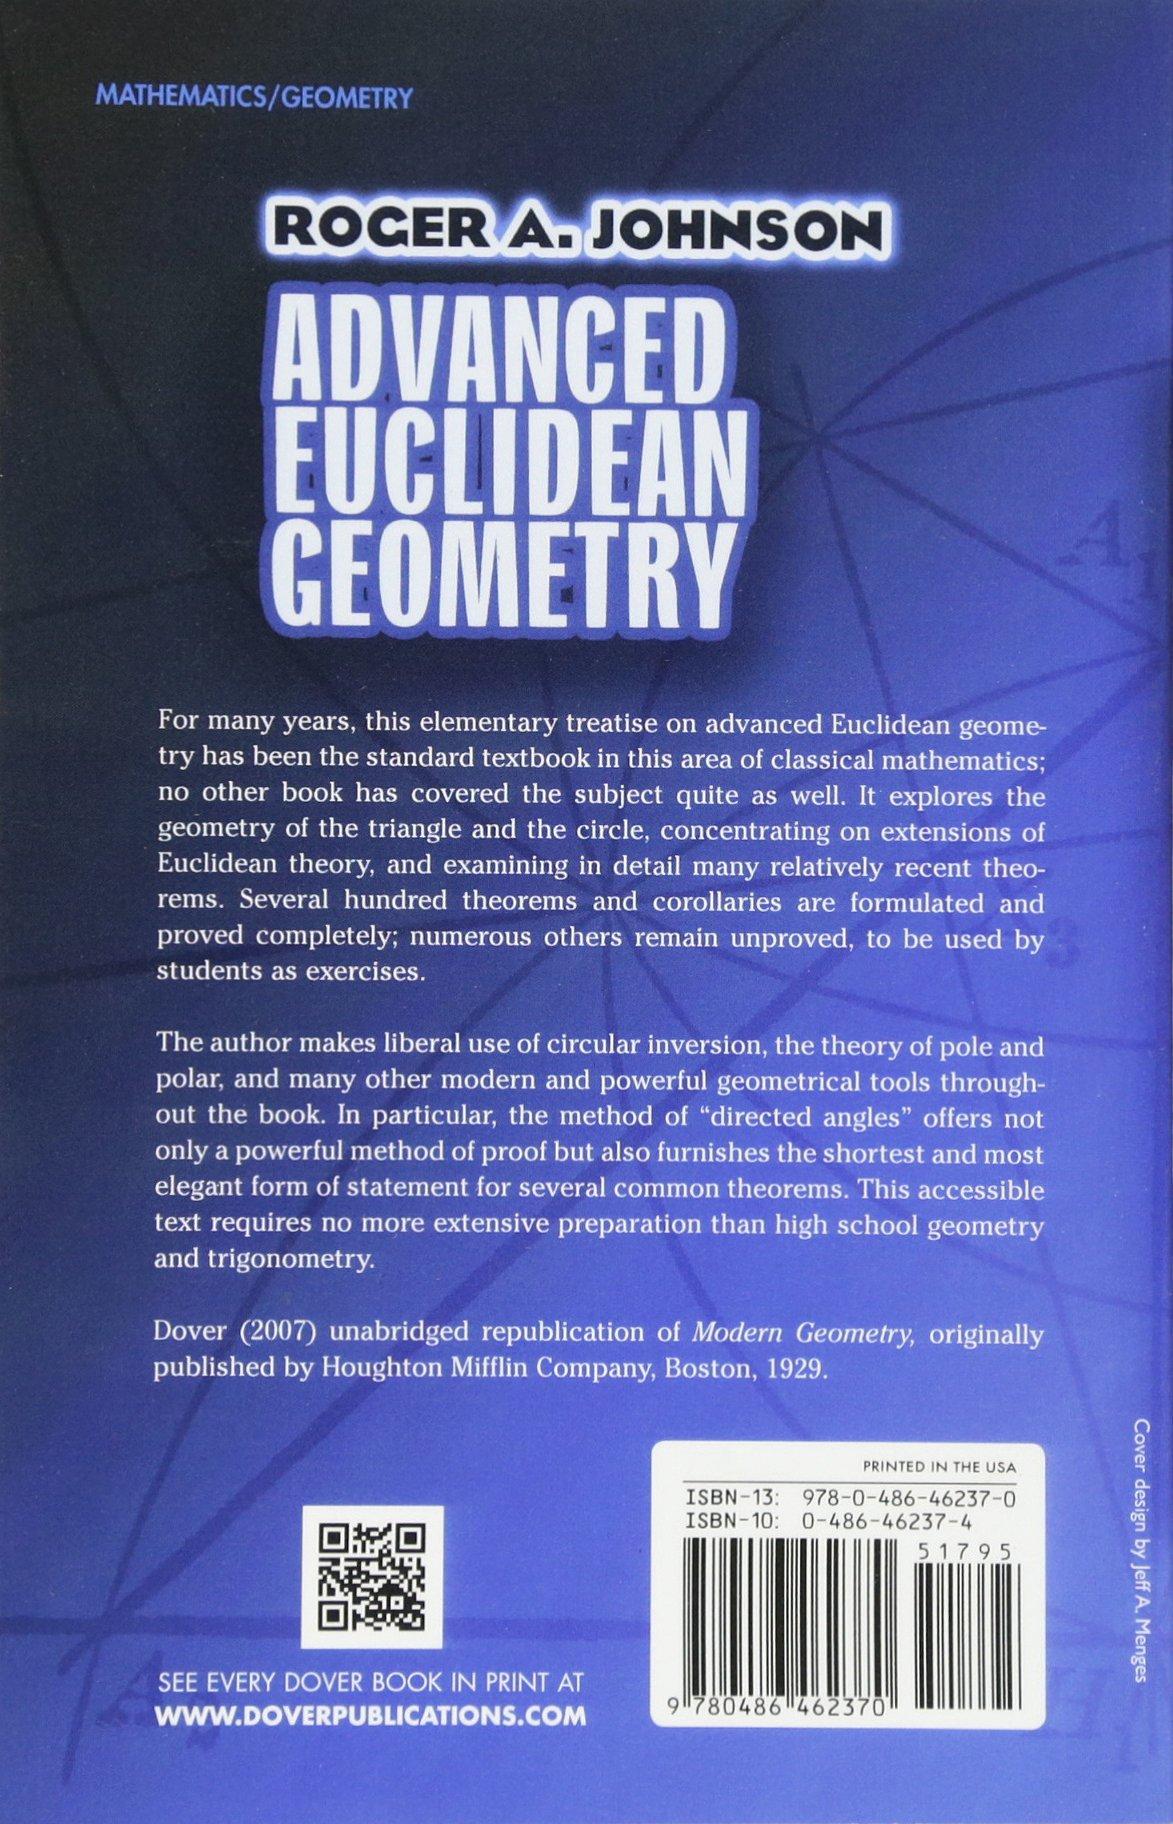 Advanced Euclidean Geometry (Dover Books on Mathematics): Amazon.co.uk:  Roger A. Johnson: 0800759462377: Books